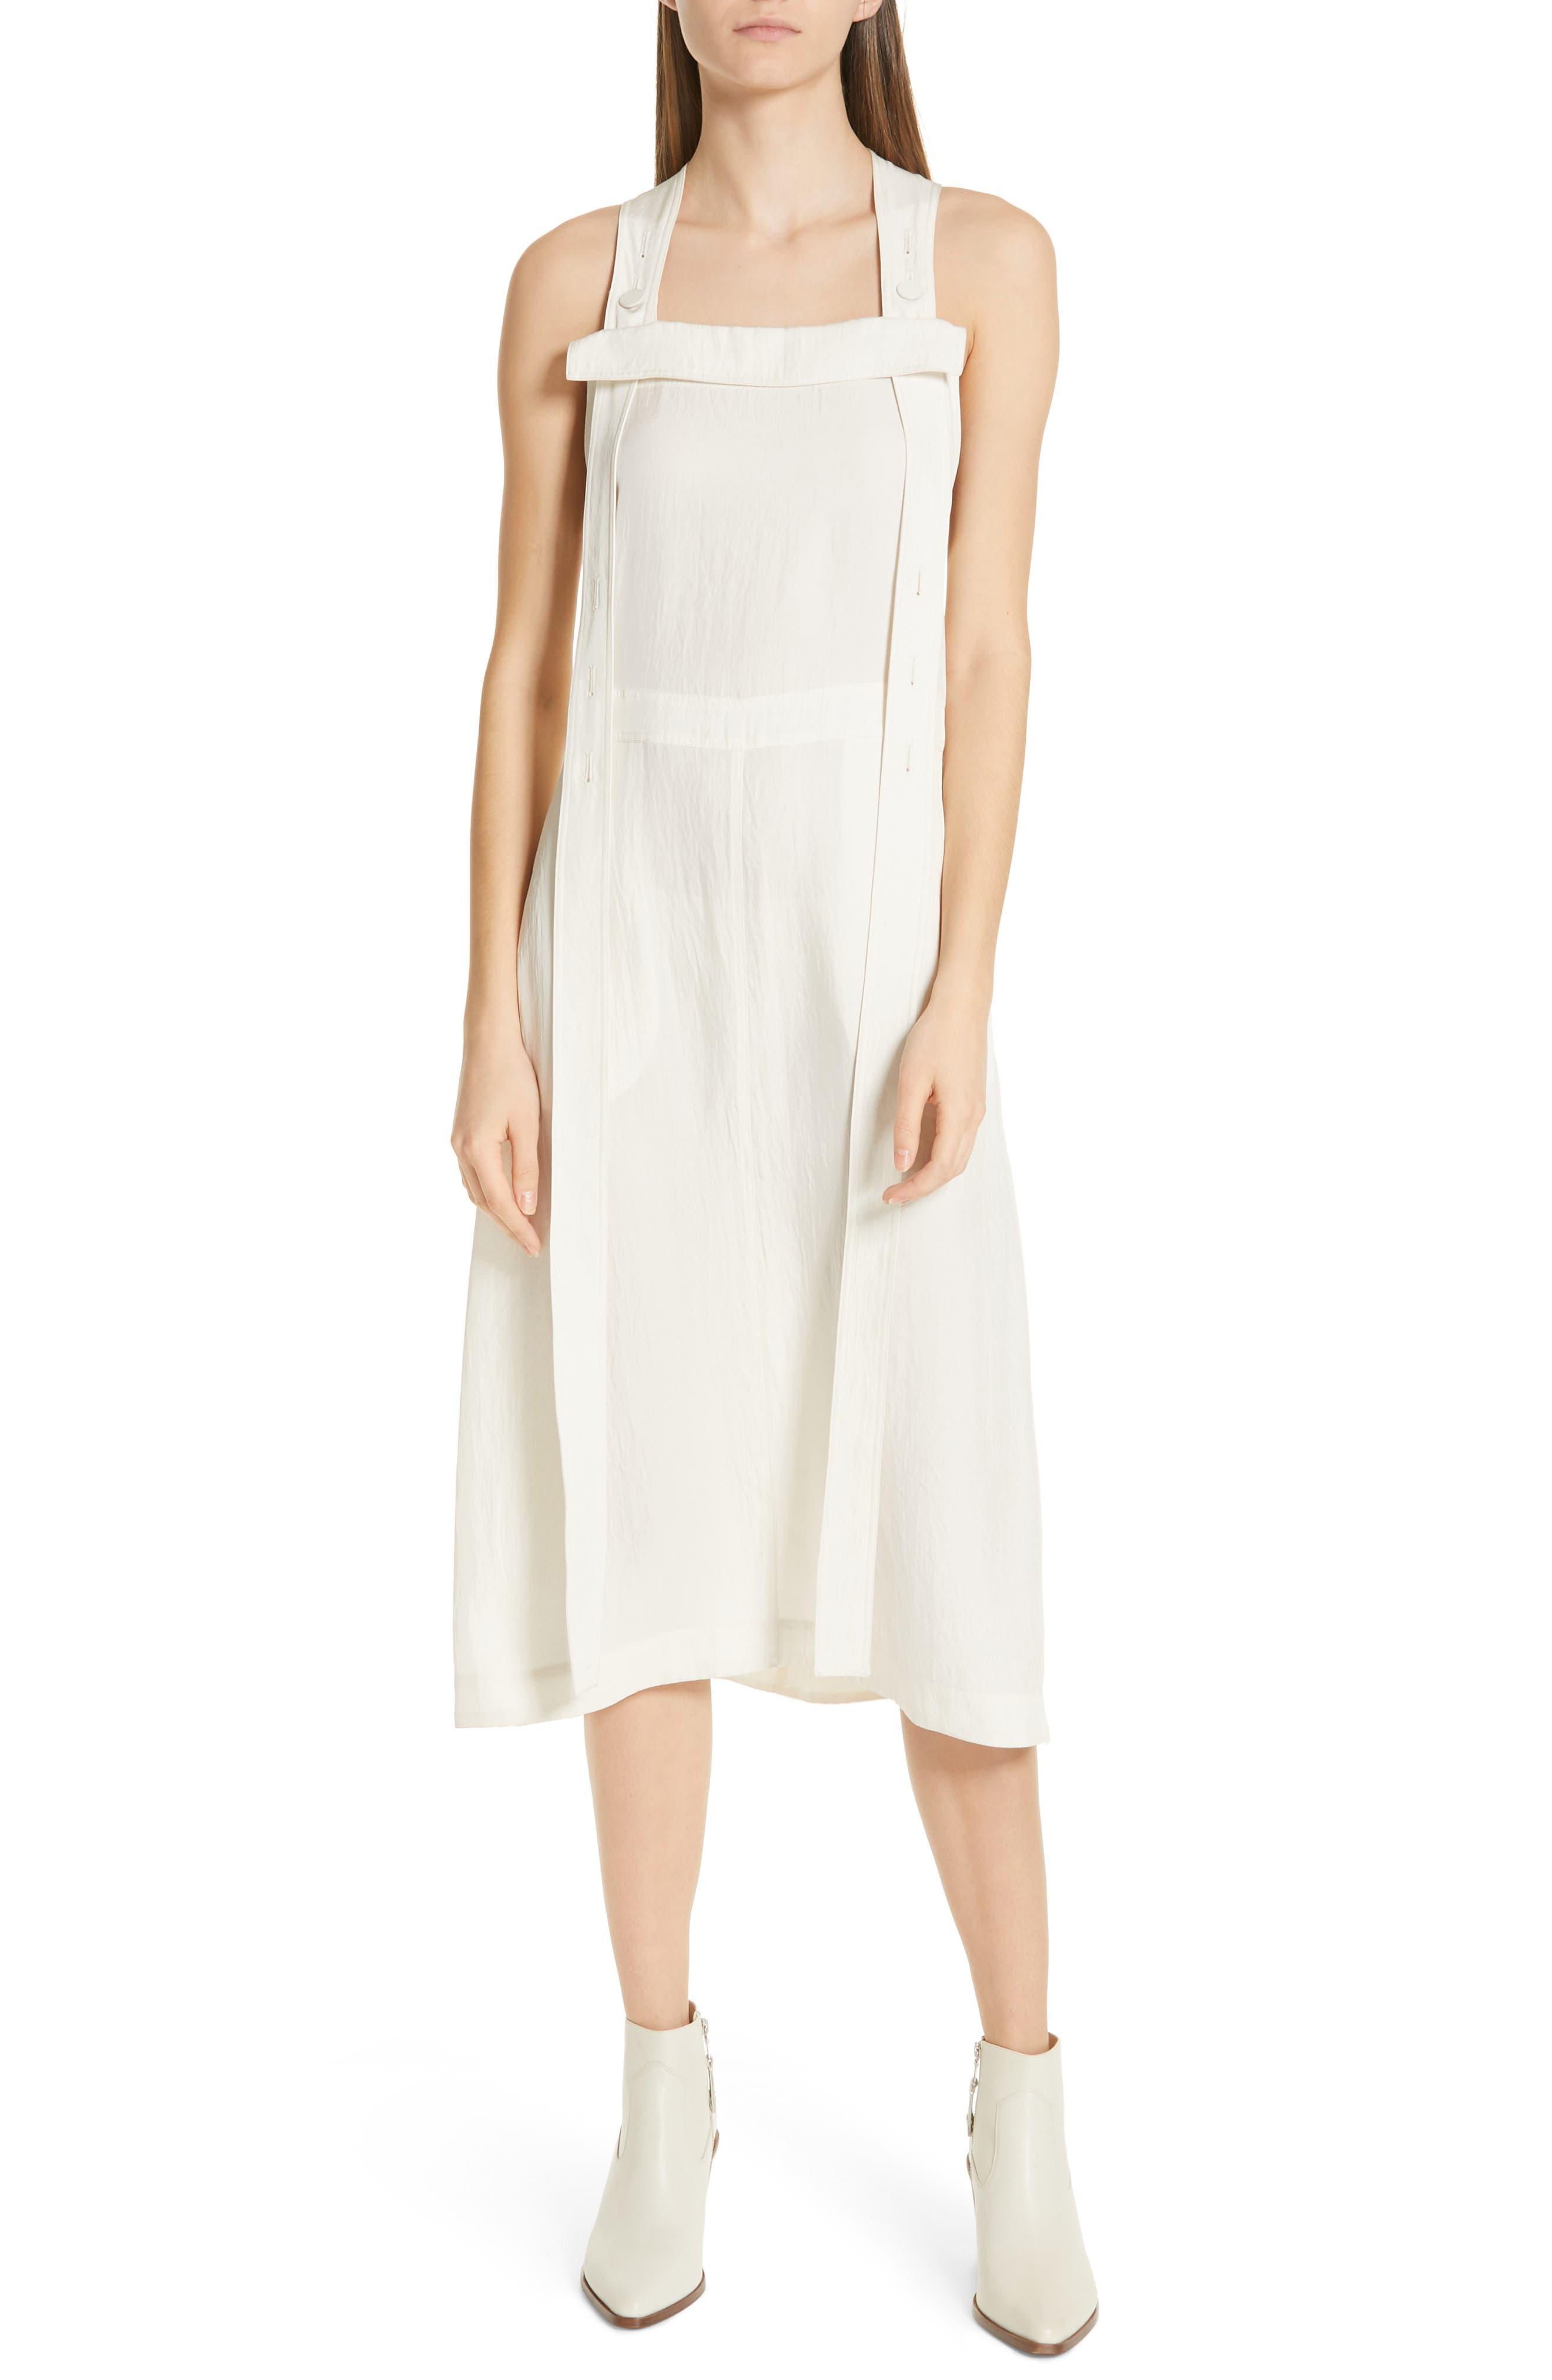 Rag & Bone Adrian Pinafore Dress, White